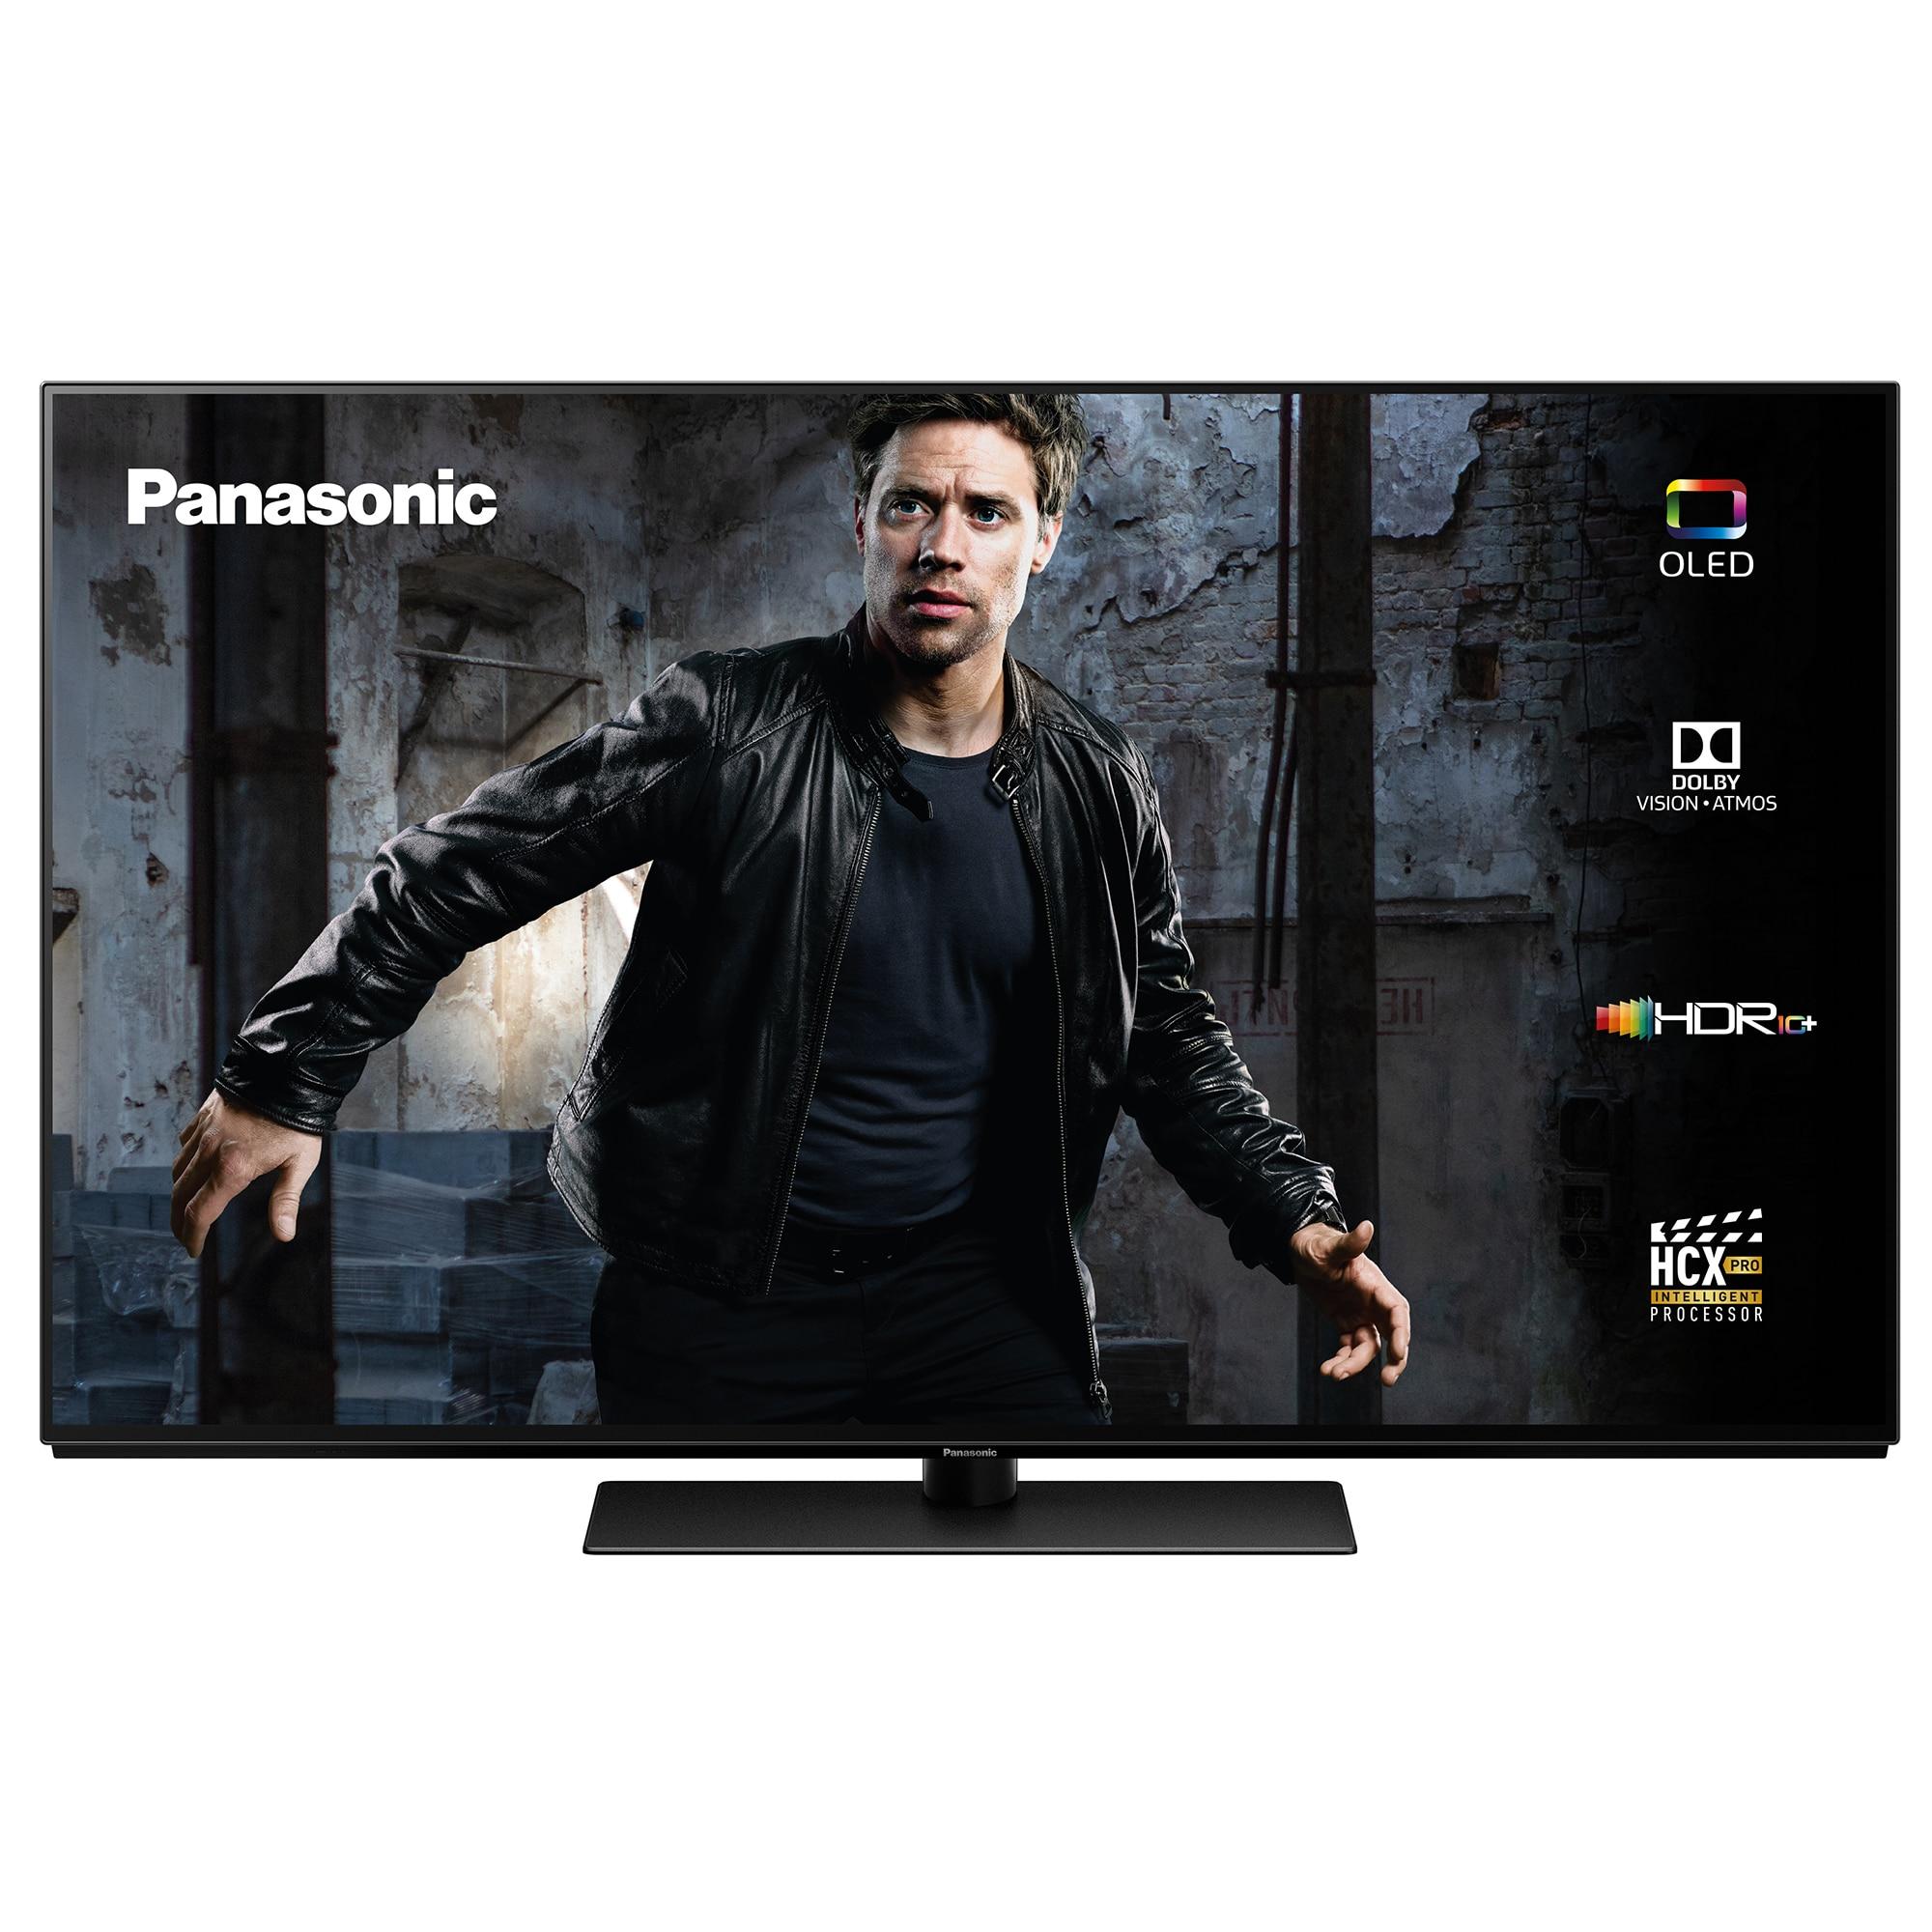 Fotografie Televizor OLED Smart Panasonic, 139 cm, TX-55GZ950E, 4K Ultra HD, Clasa A